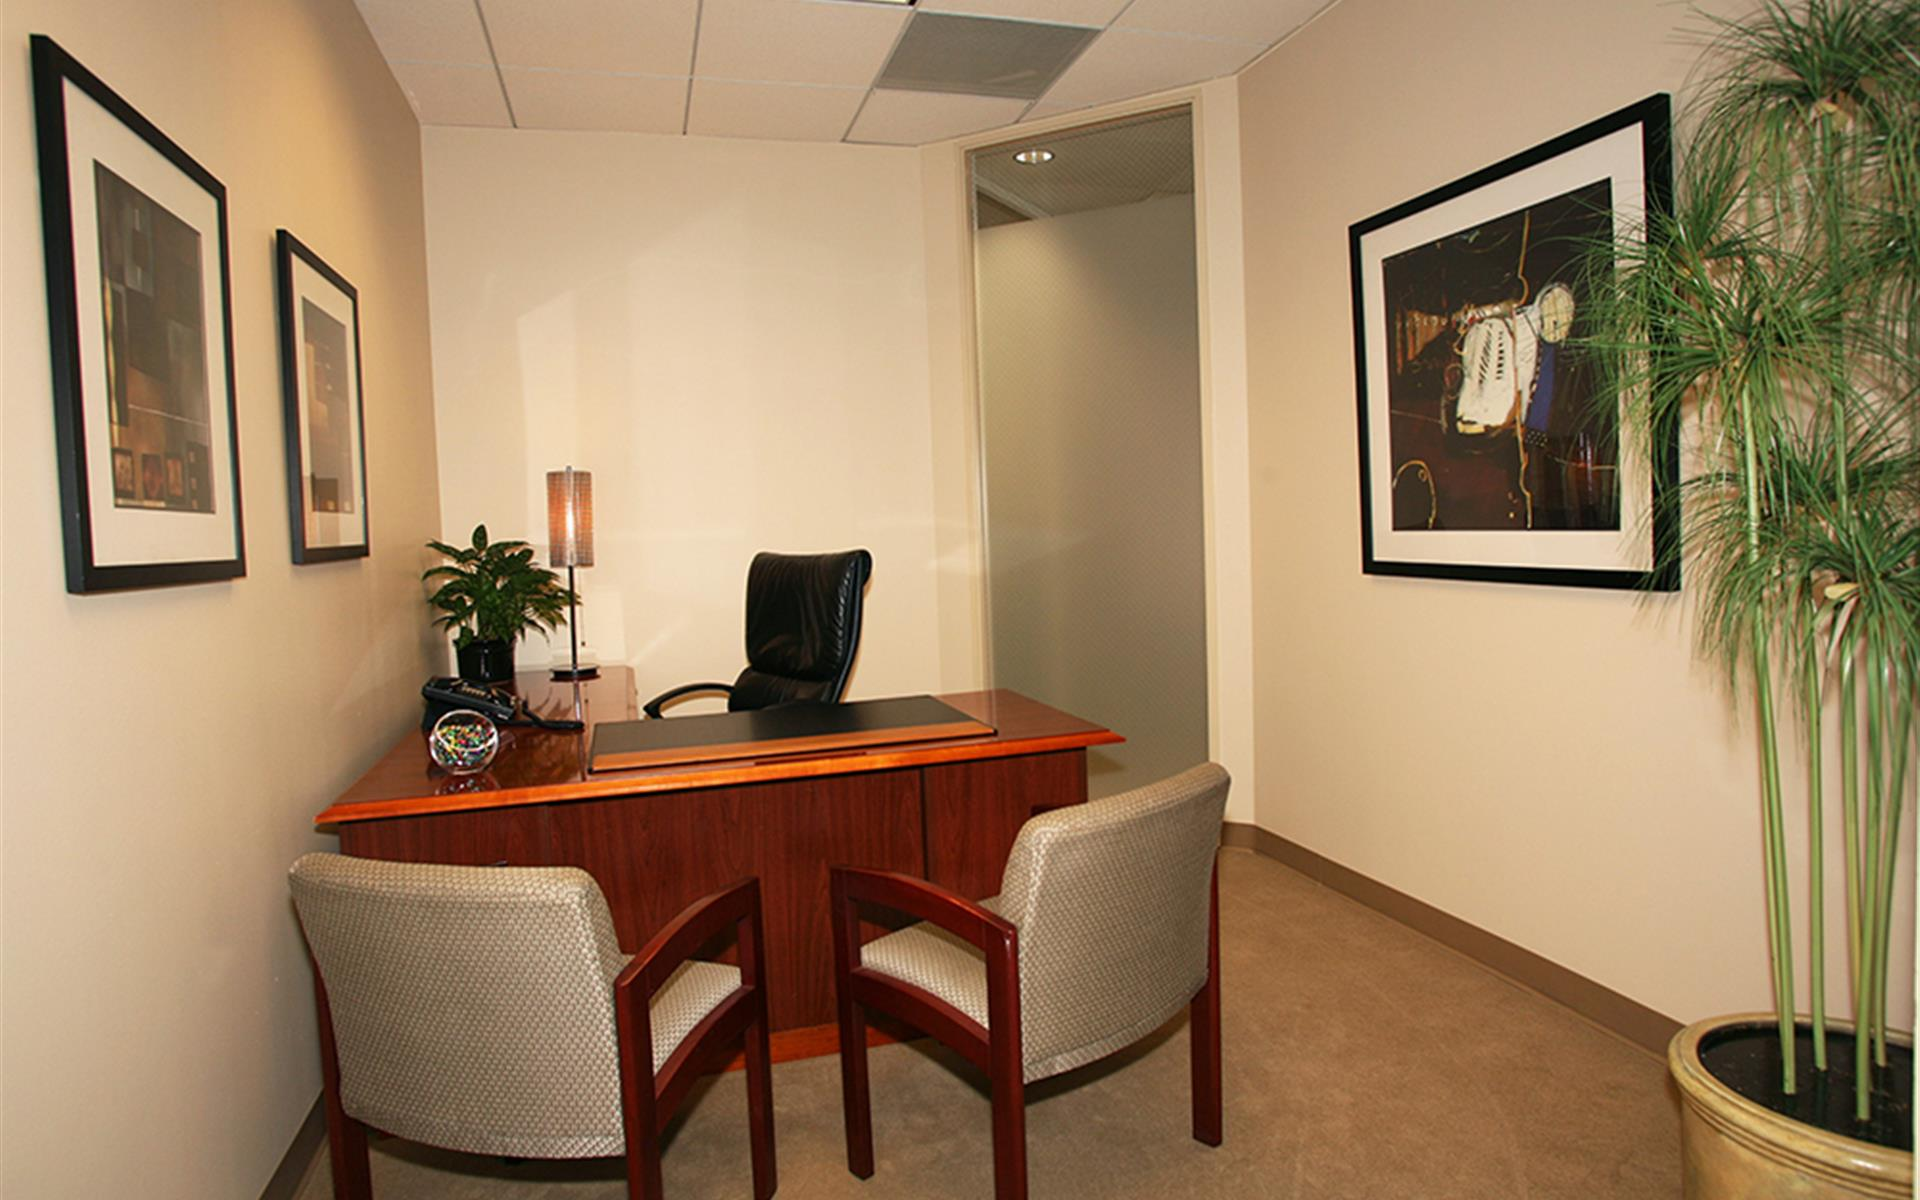 (PAR) Jamboree Center - Interior Office